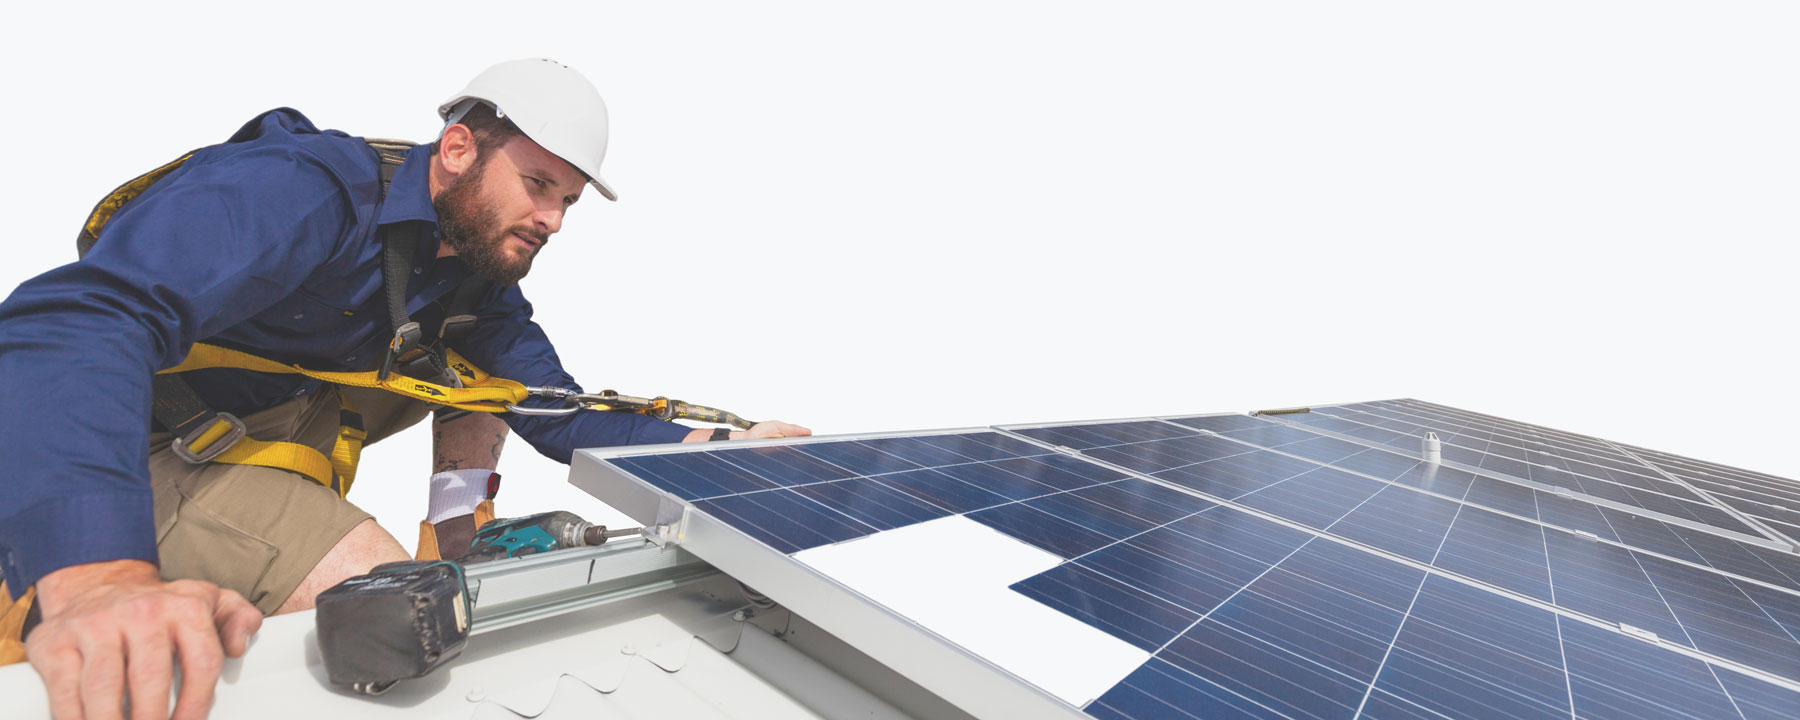 SolarWorx Energy installing solar panels on roof in Tuolumne County